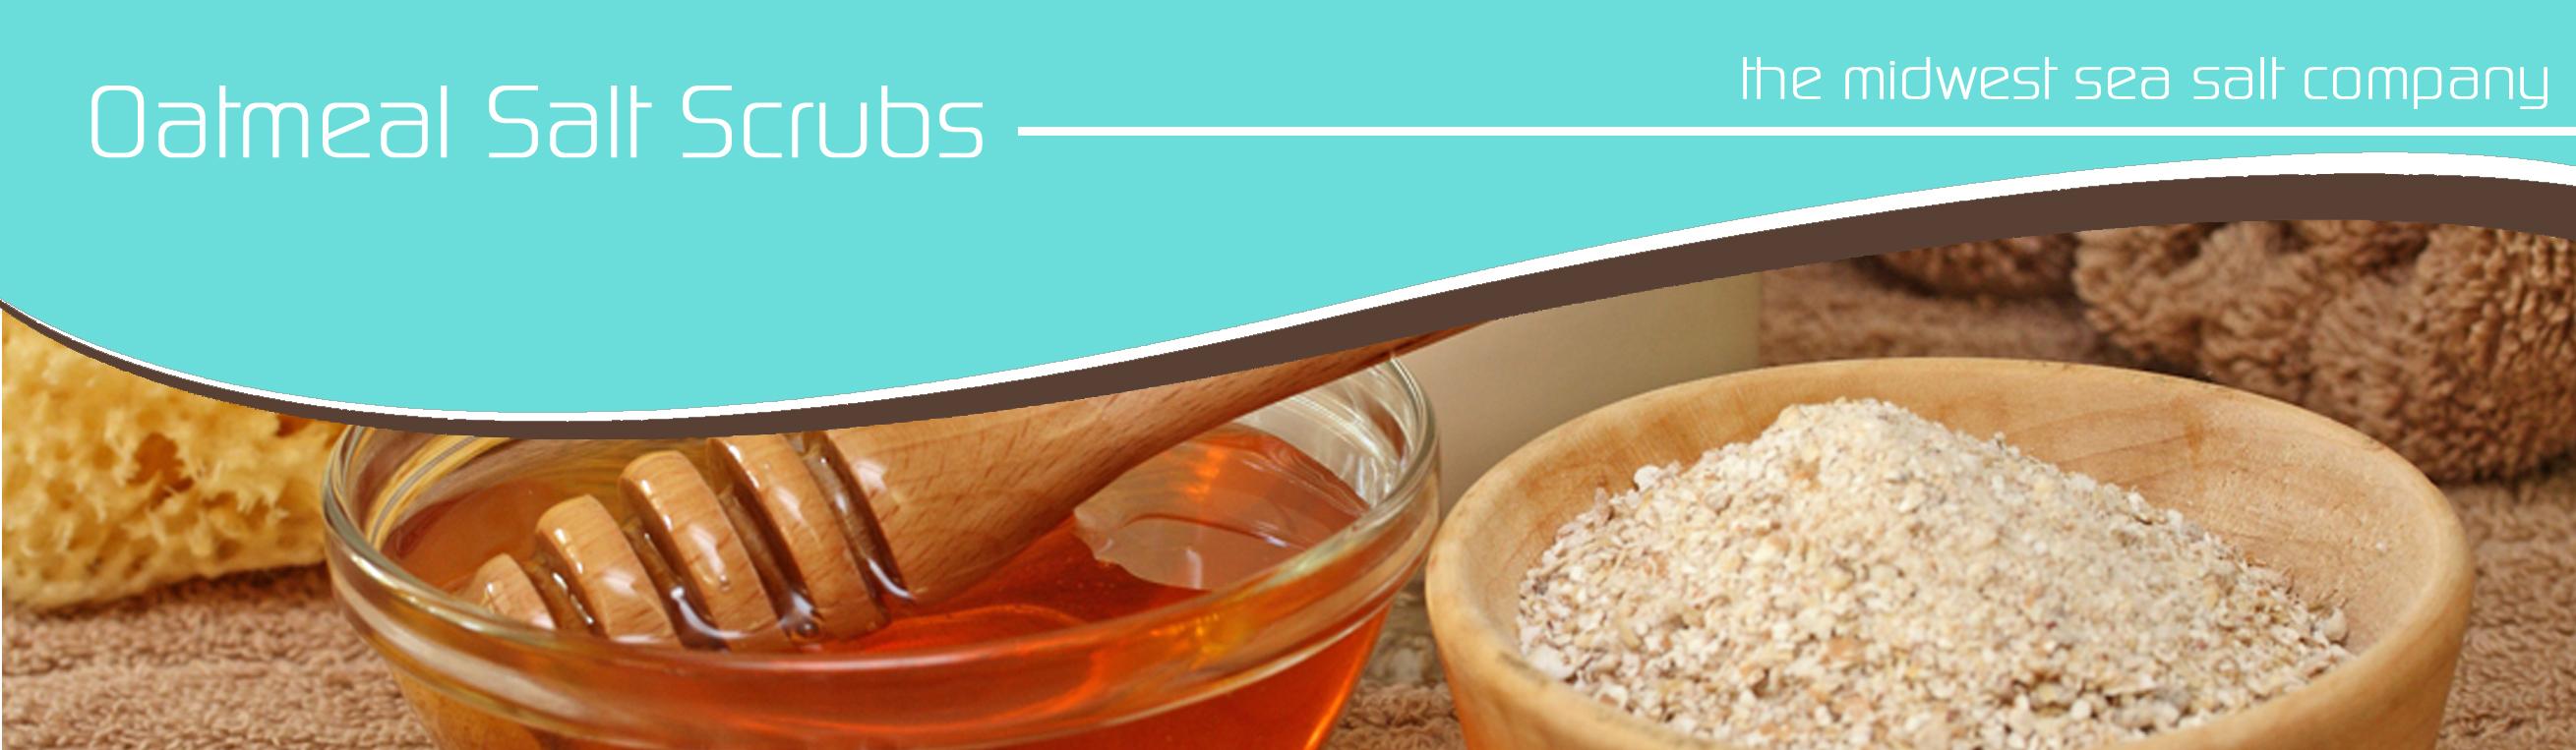 oatmeal-salt-scrubs-midwest-sea-salt.jpg